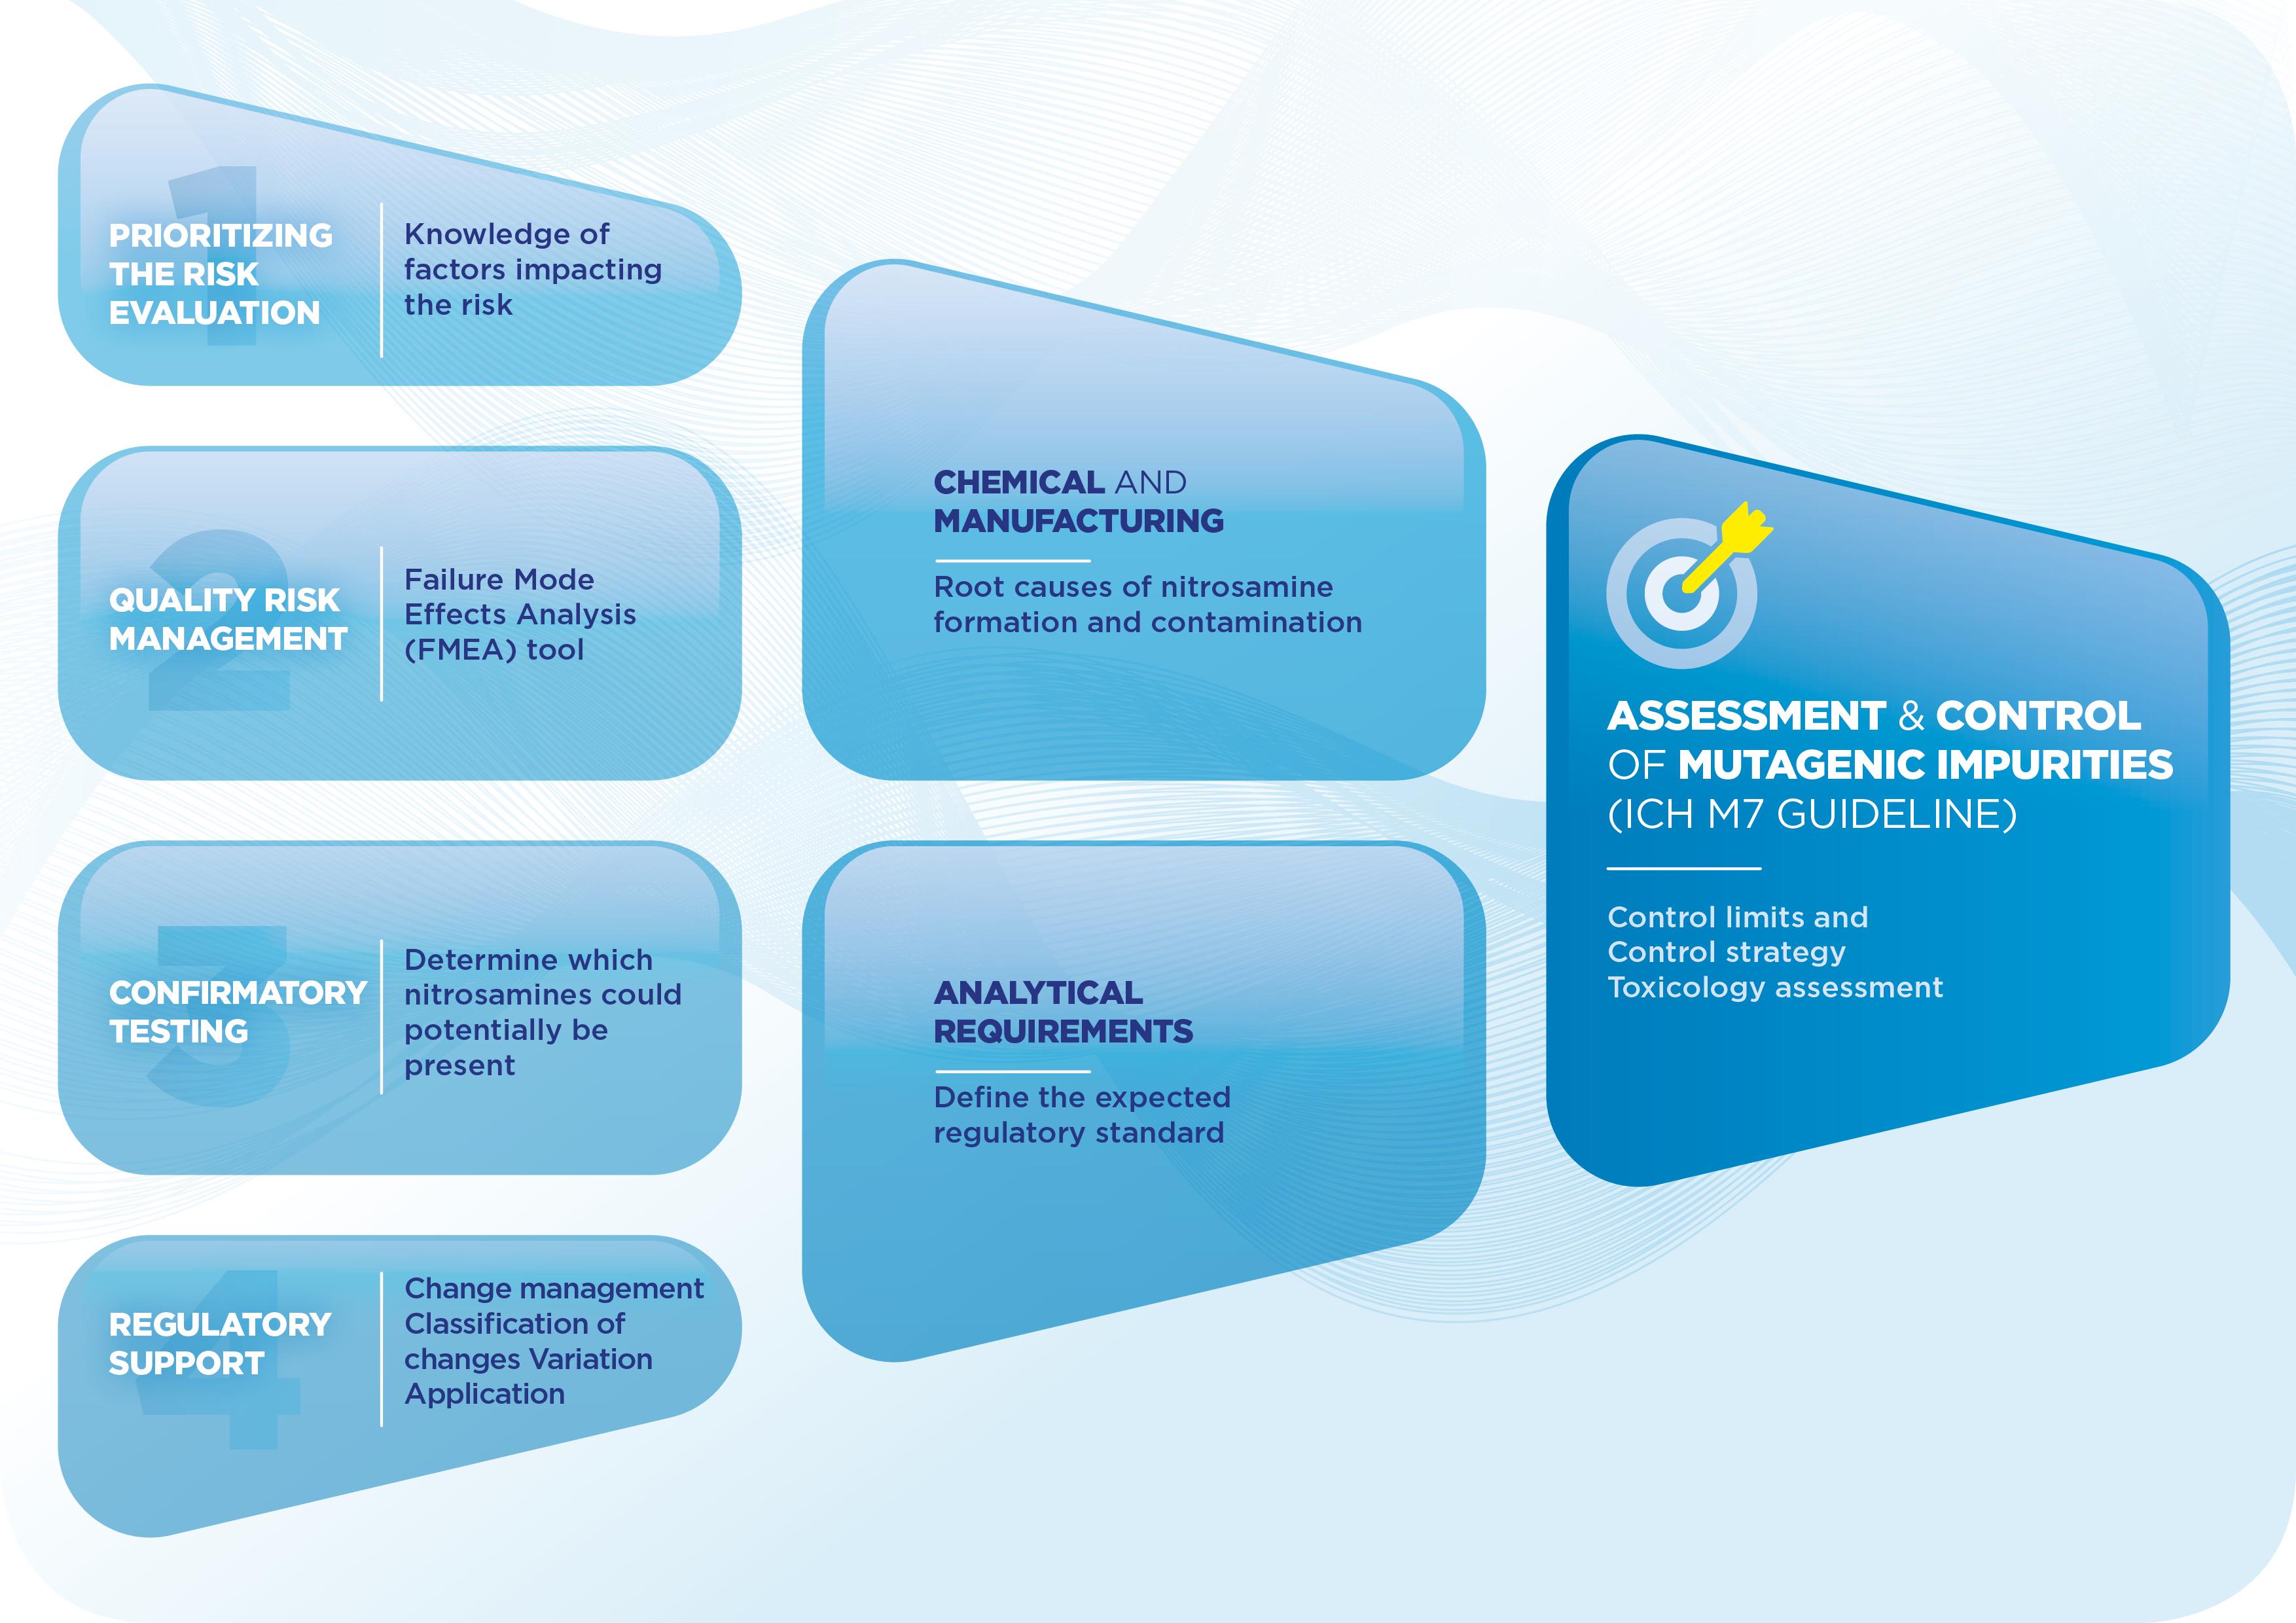 CDMh nitrosammine impurities assessment and control ICHm7 guideline flow